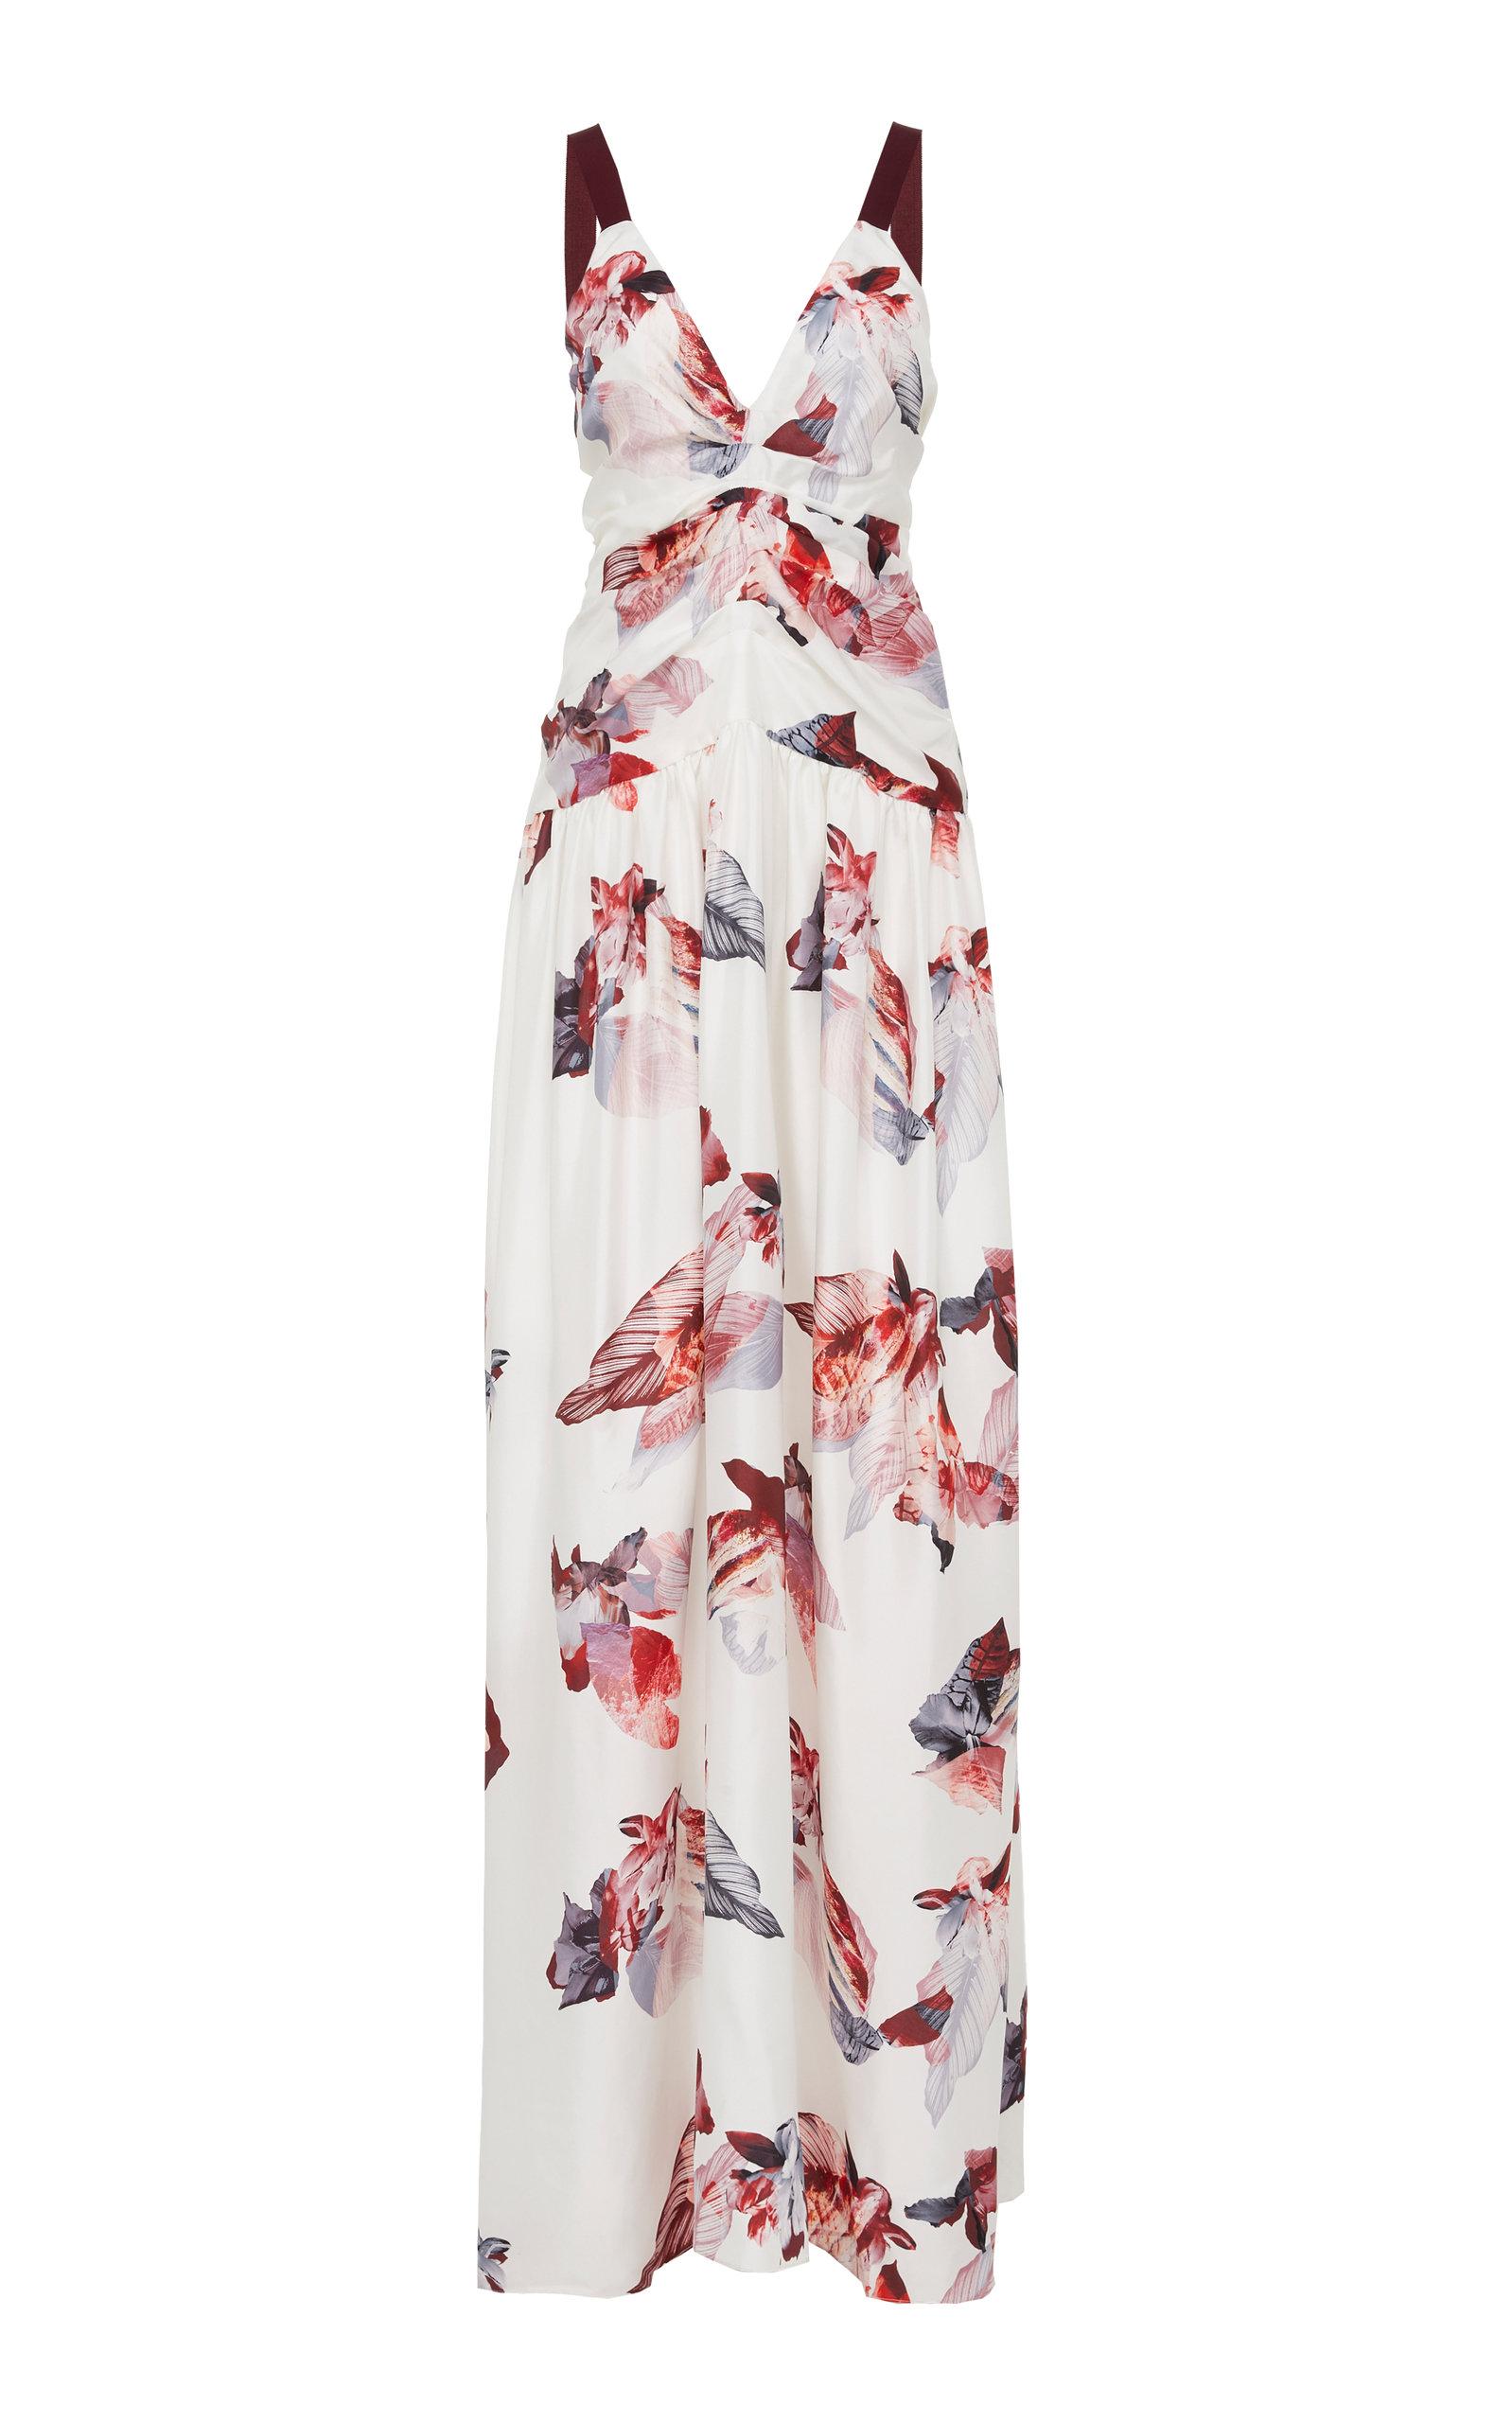 YEON THALIA FLORAL SILK DRESS